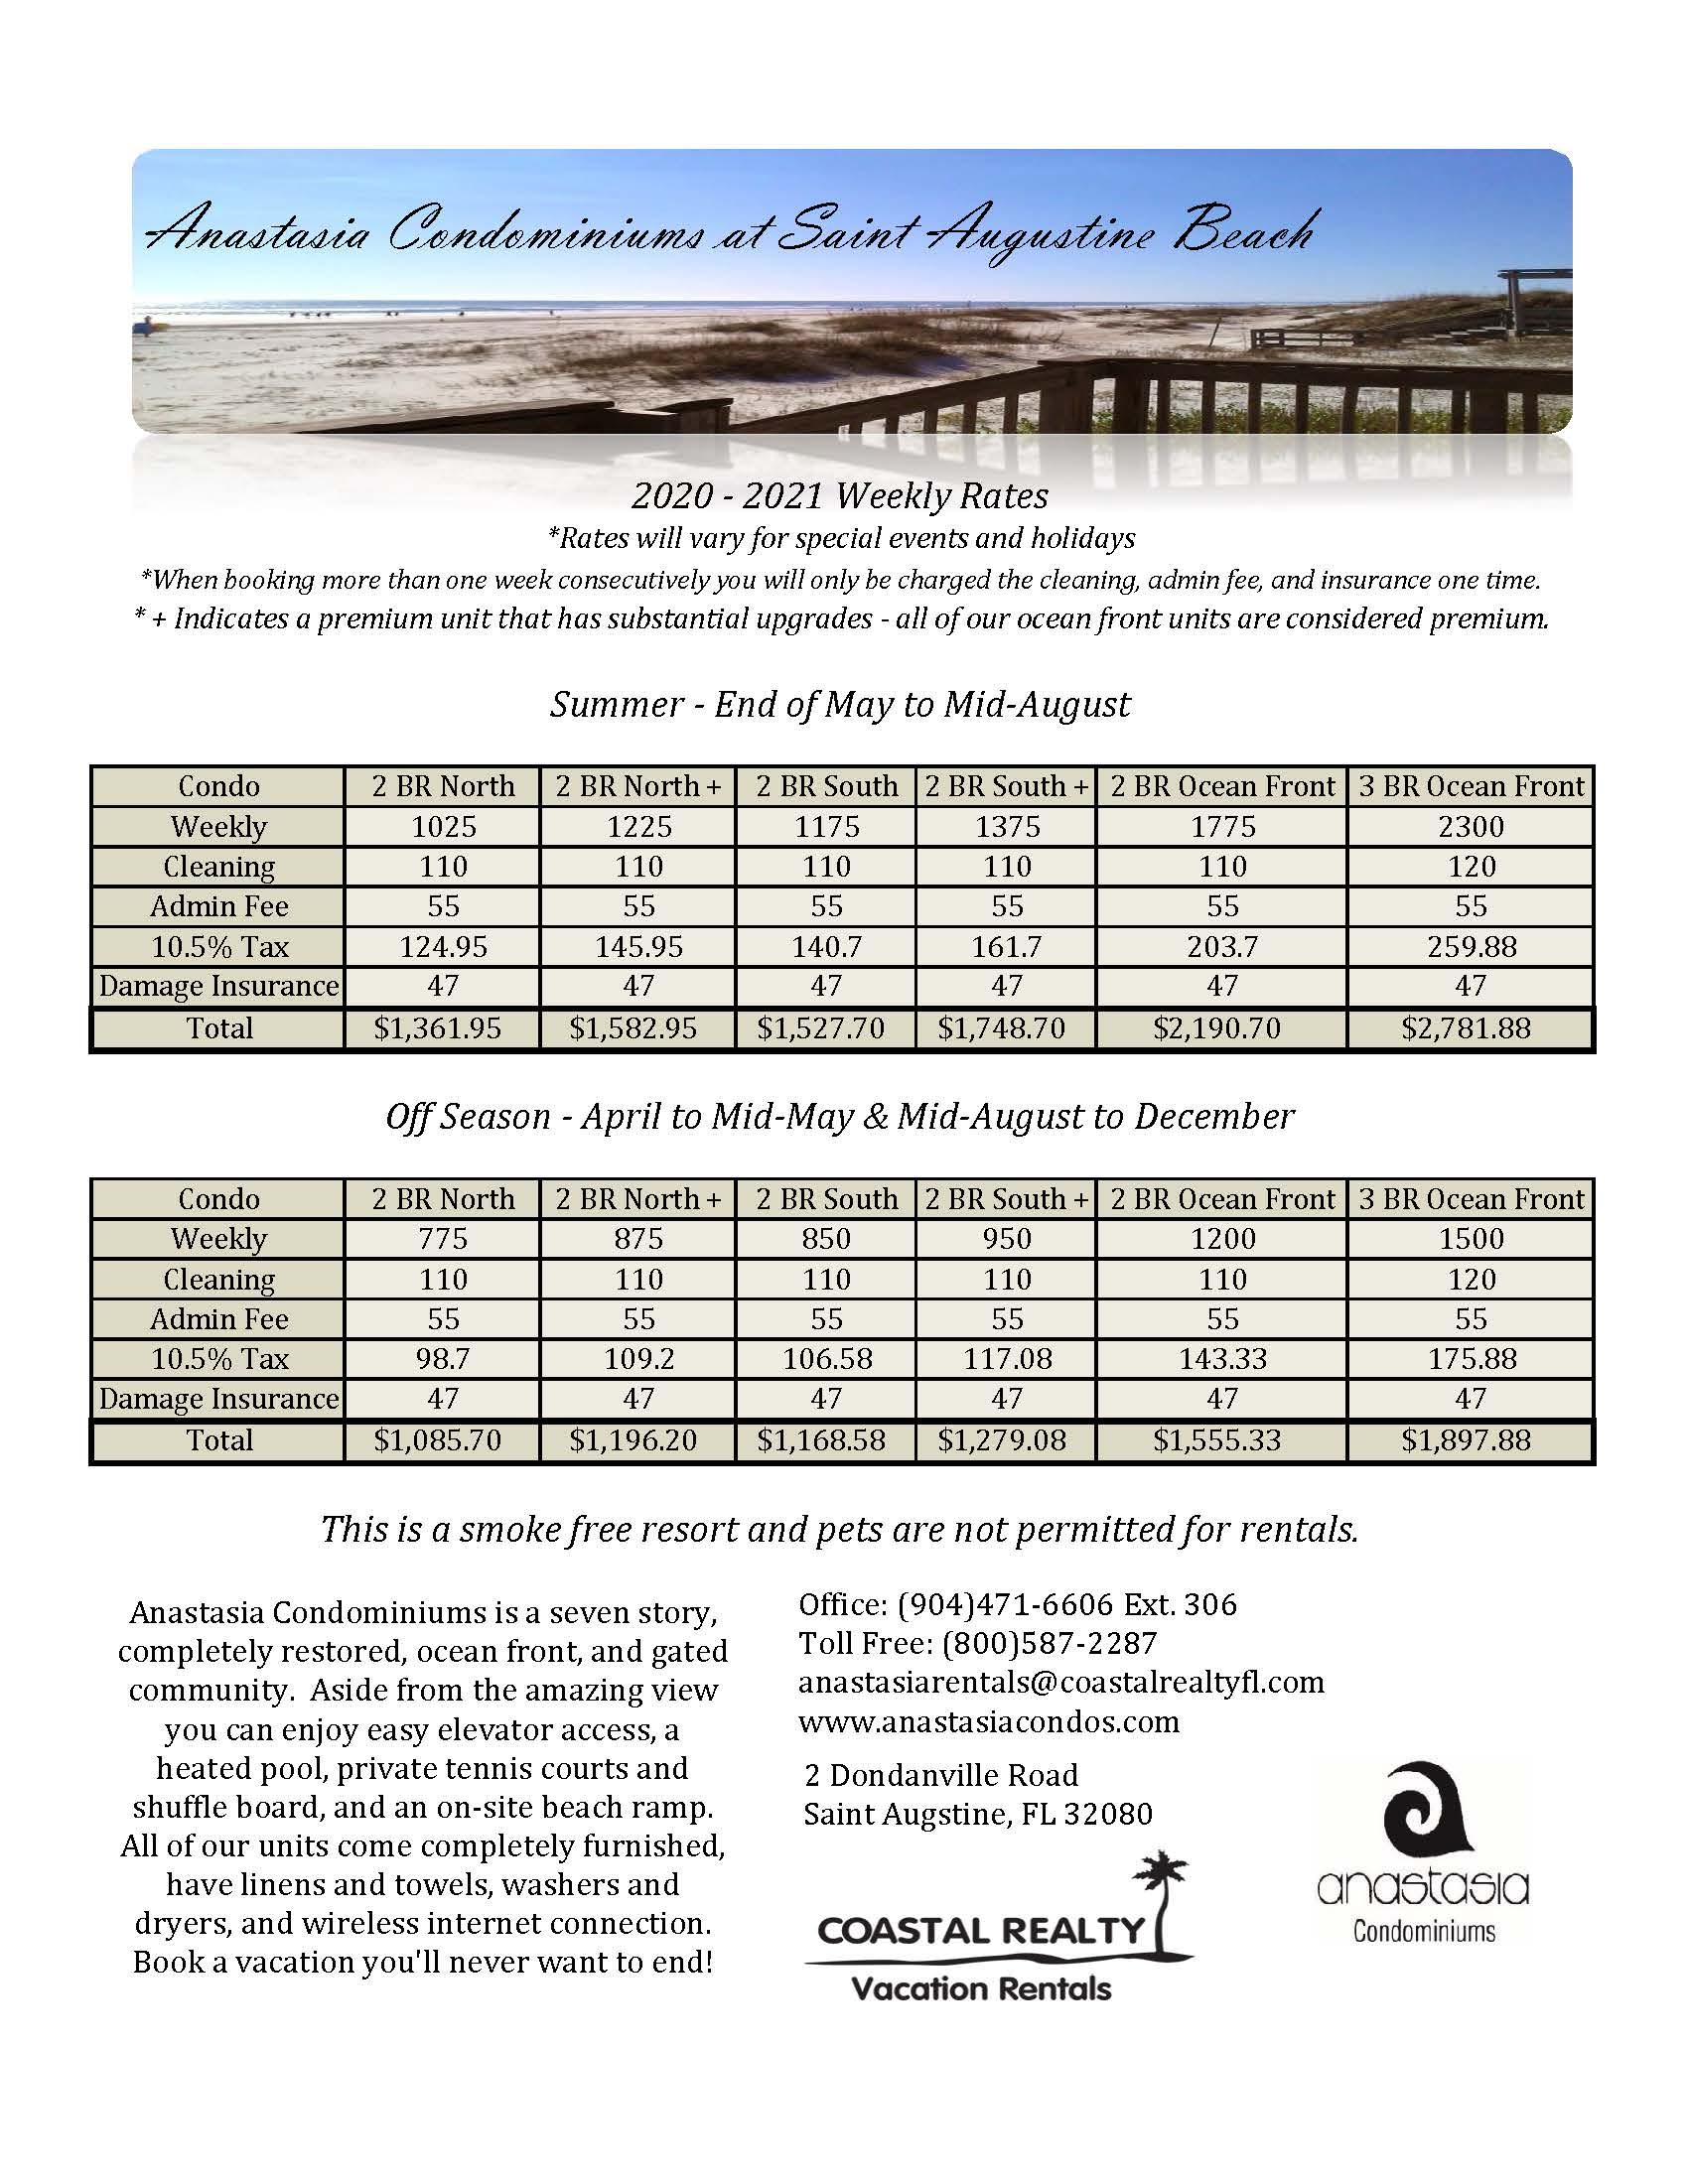 2020 2021 weekly rates at anastasia condominiums